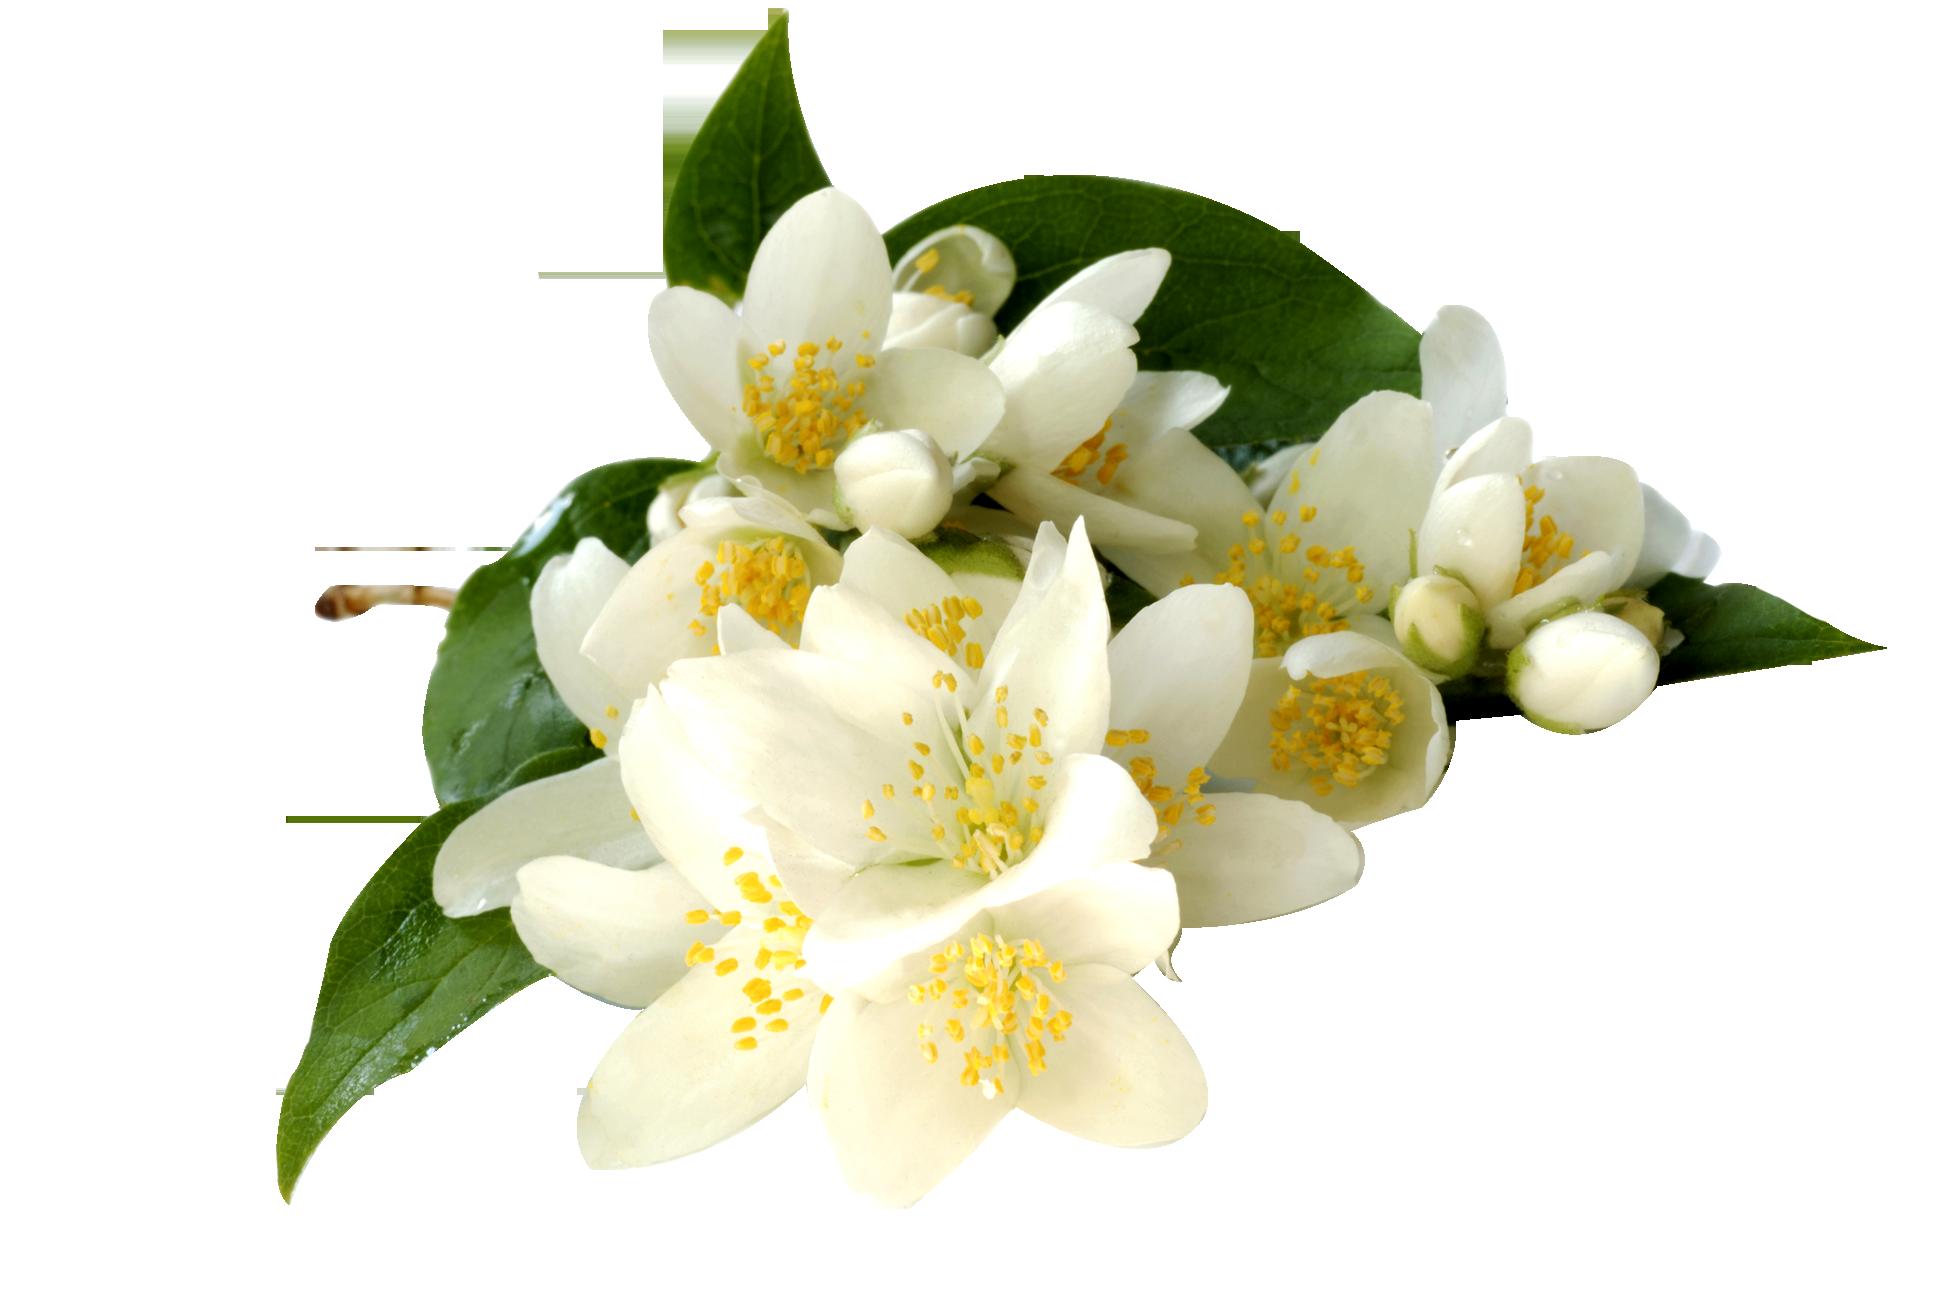 Image jasmine flower transparentg animal jam clans wiki jasmine flower transparentg izmirmasajfo